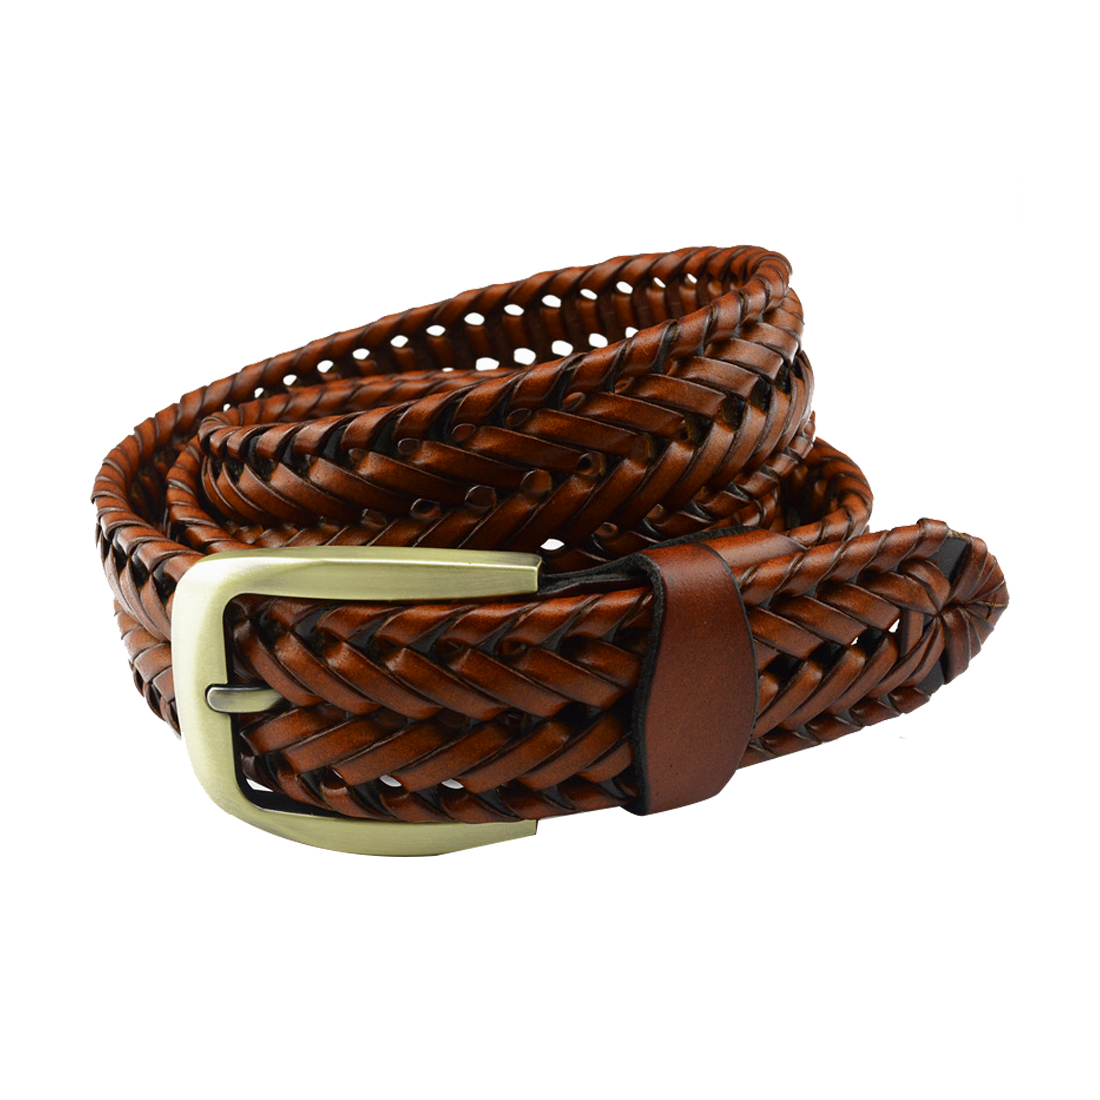 Unisex Hand Made Braided Alloy Pin Buckle Imitation Leather Belt Camel